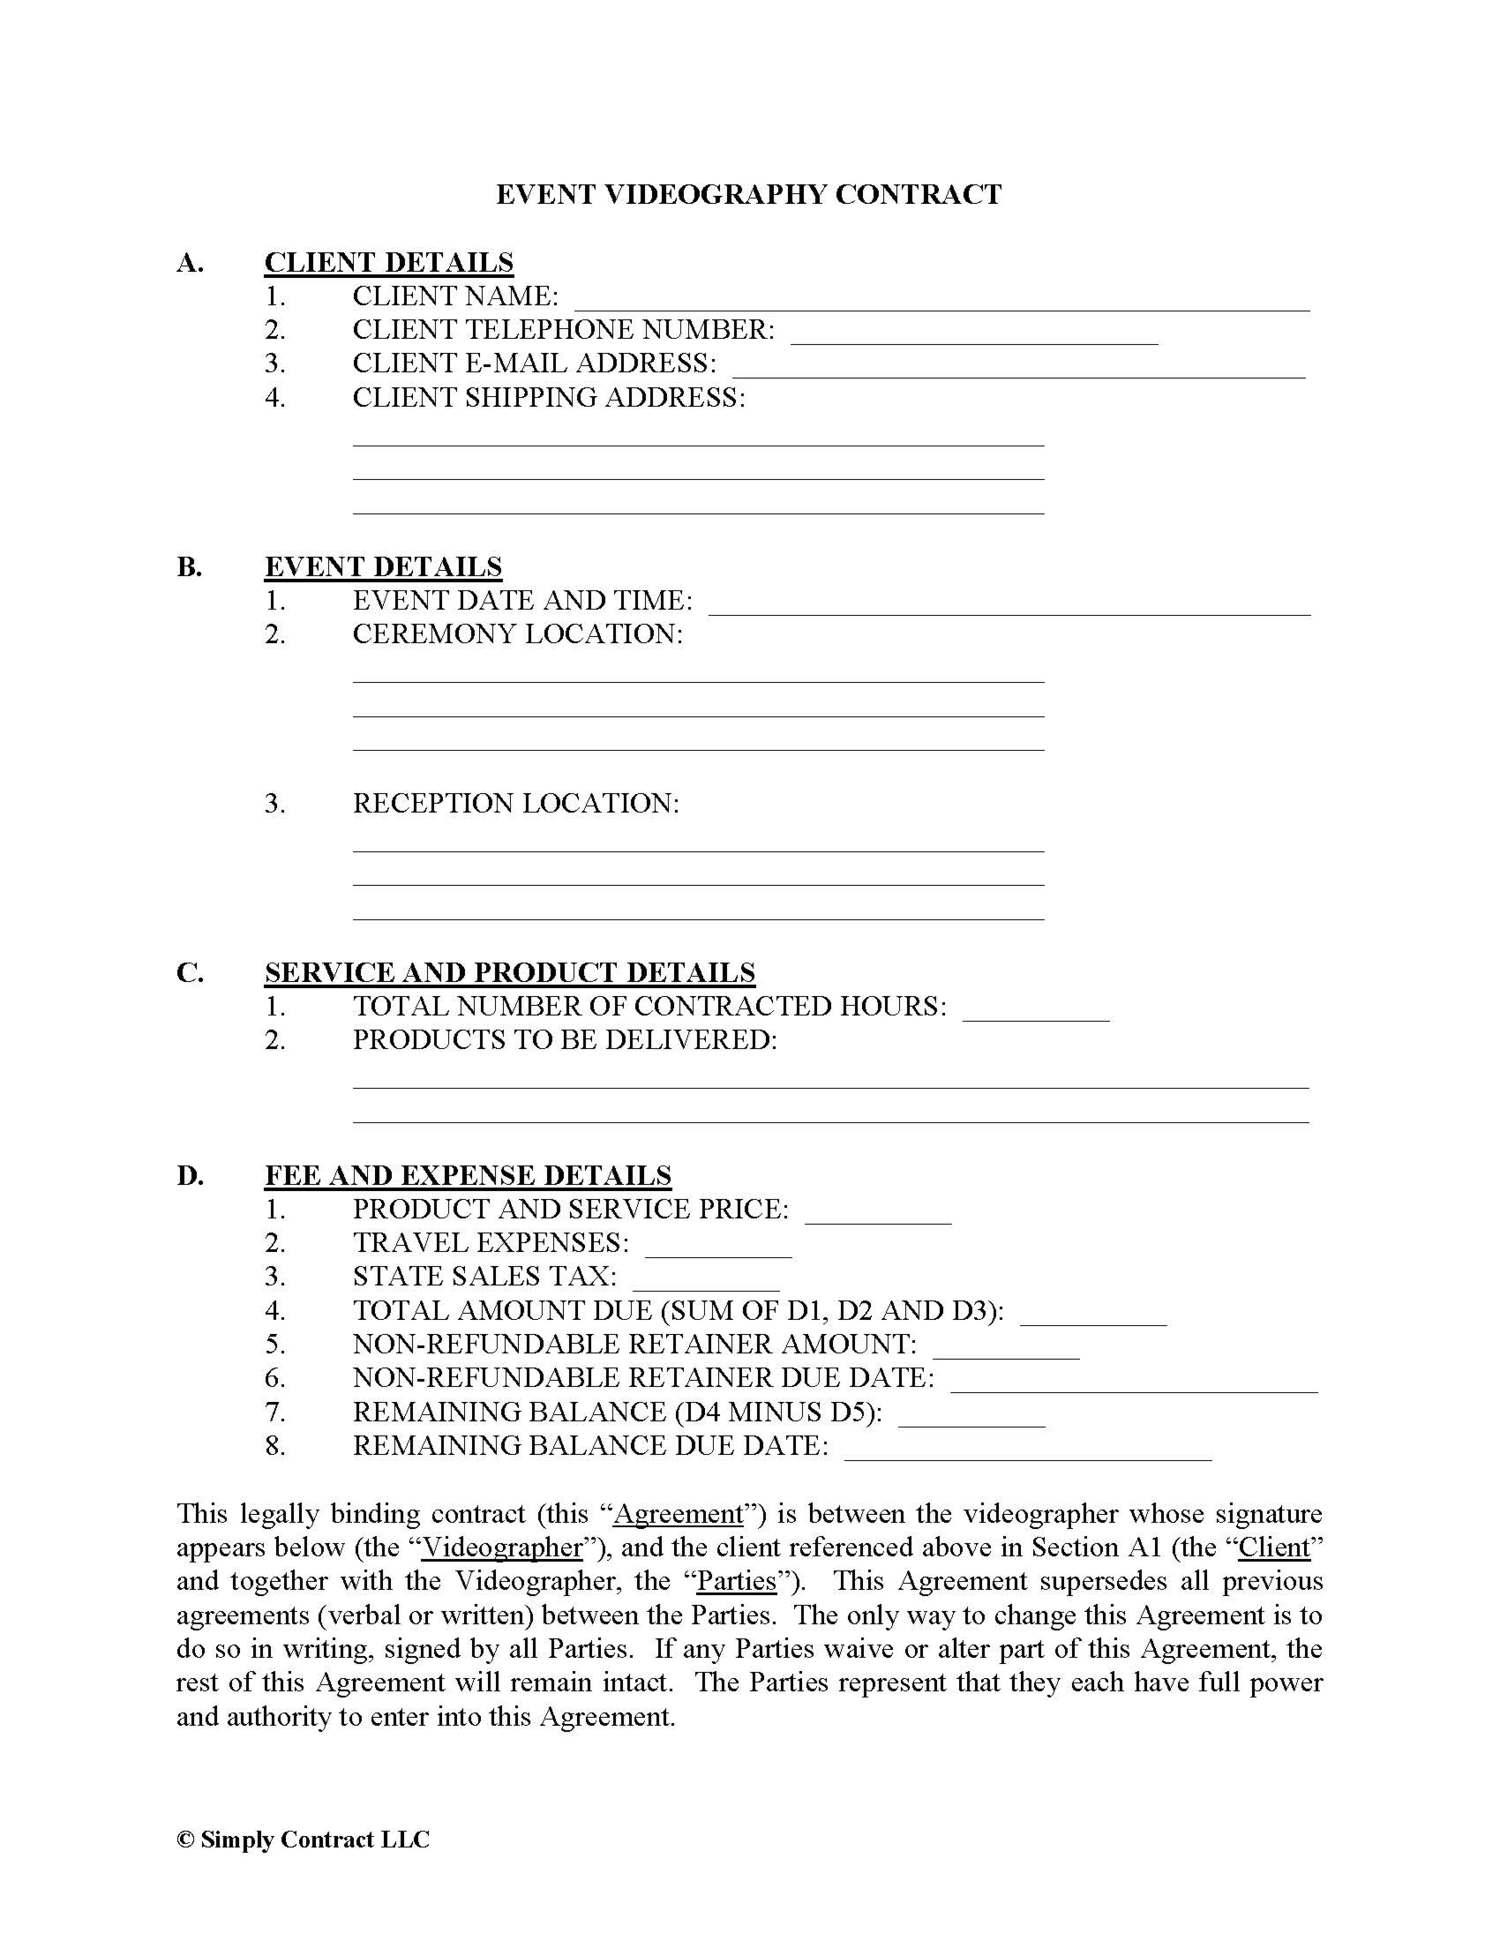 Video Clip License Agreement Template & Sample Form   Biztree.com